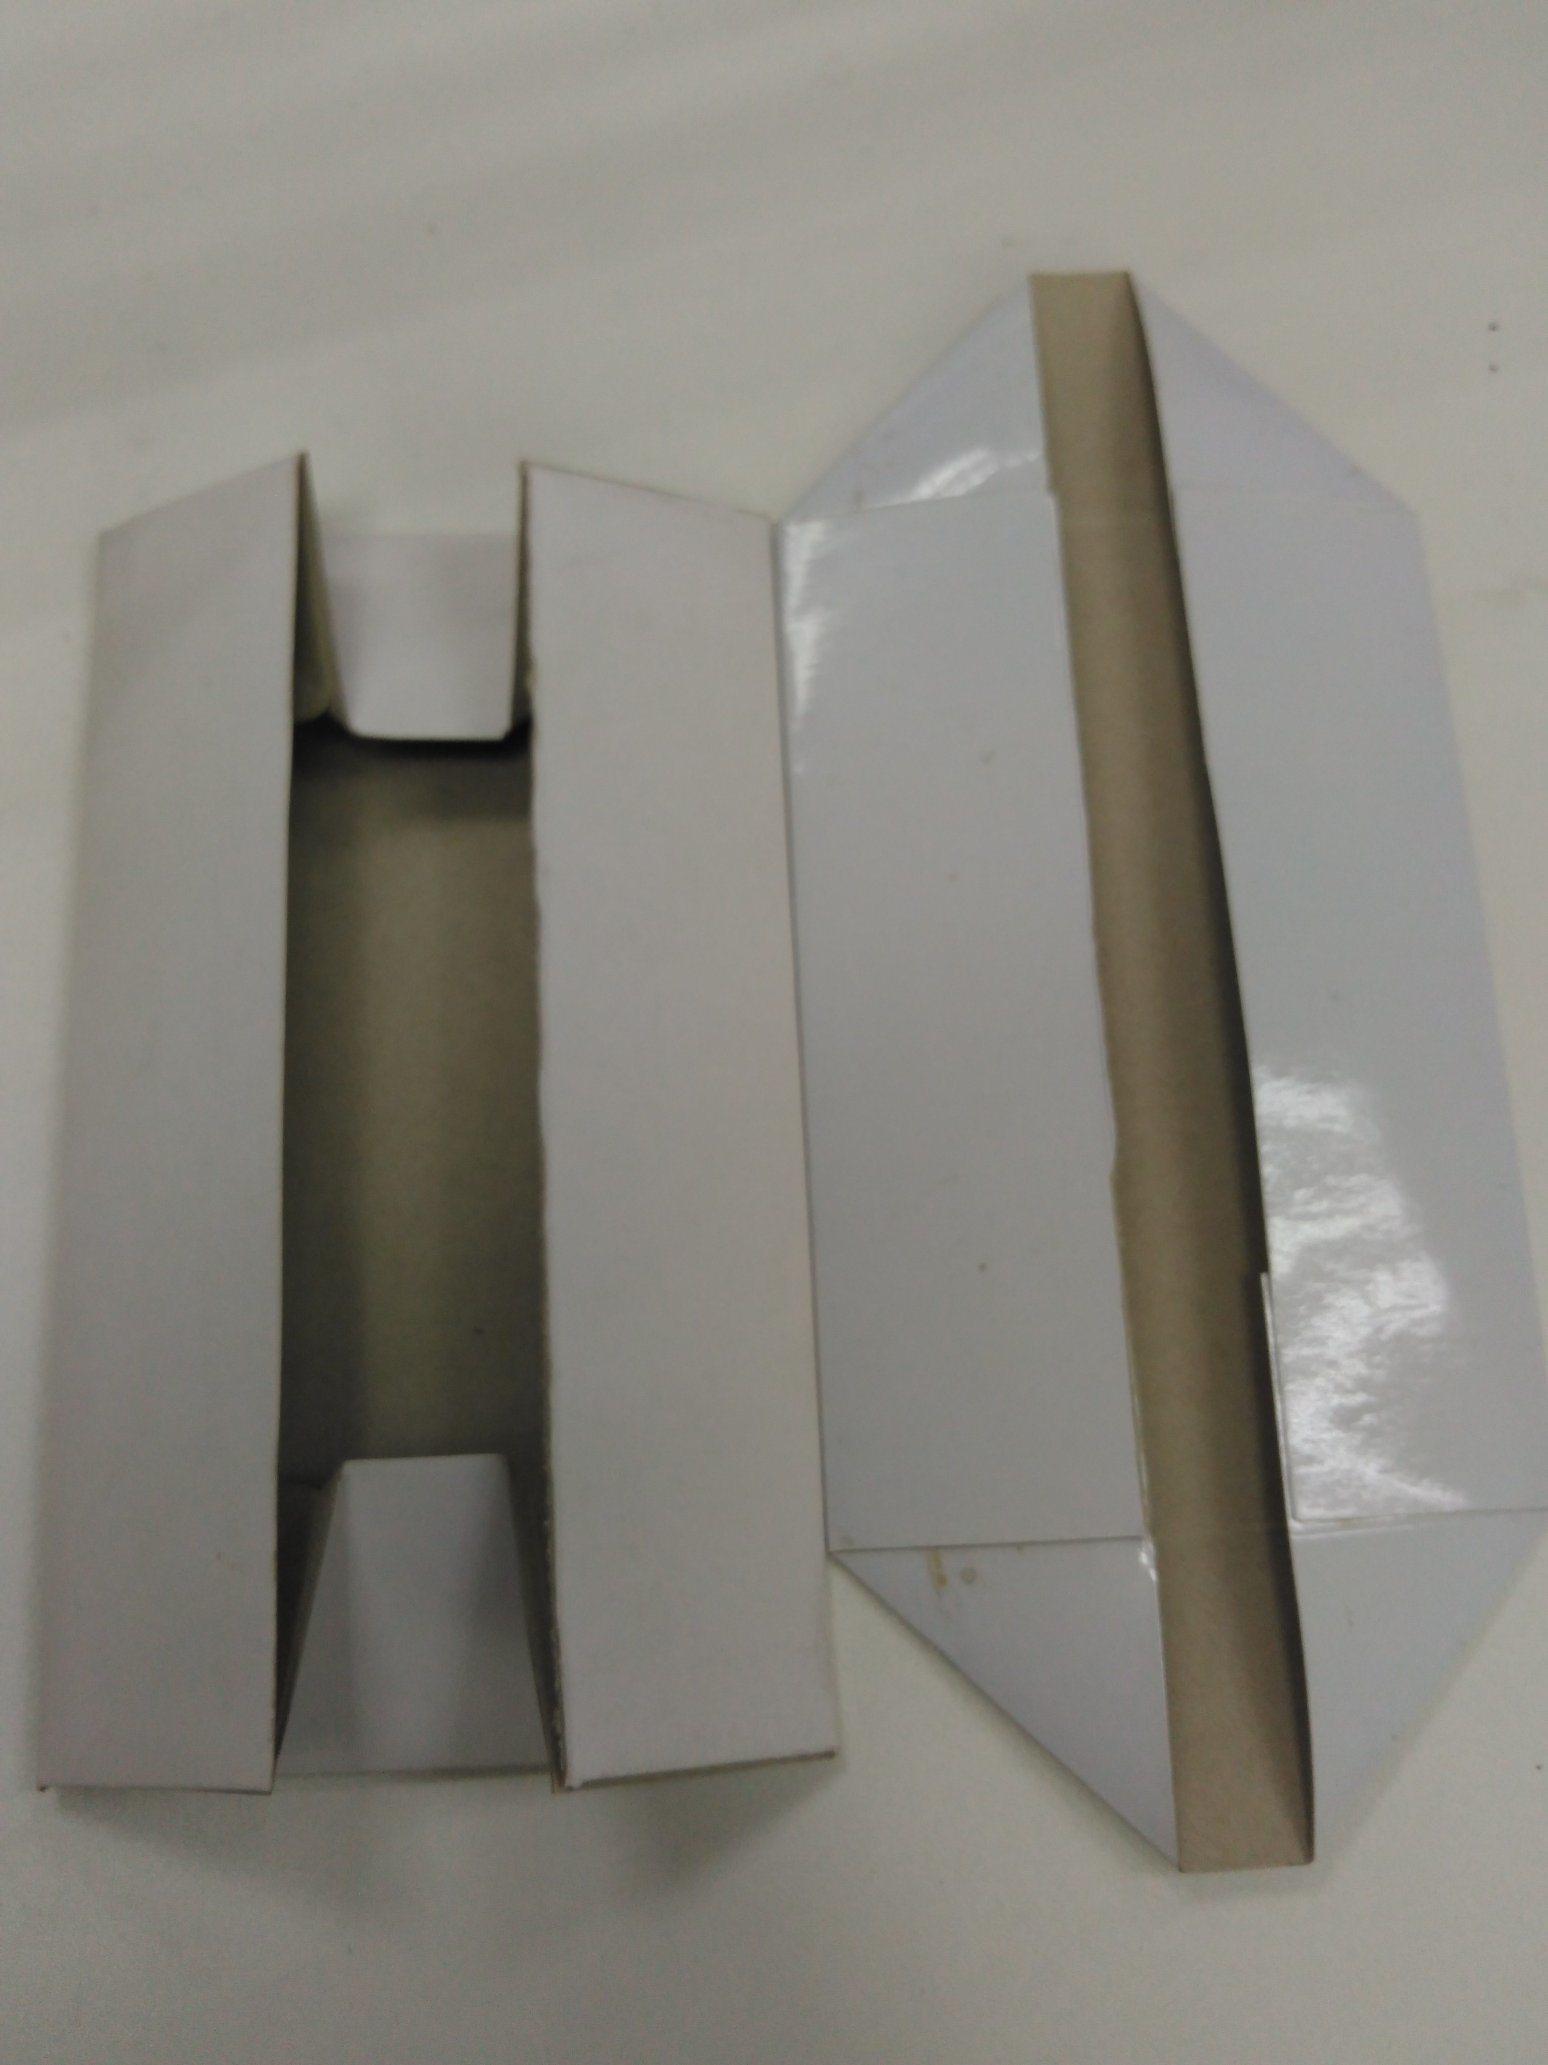 Xcs-1100c4c6 4/6 Corner Box Folder Gluer Machine